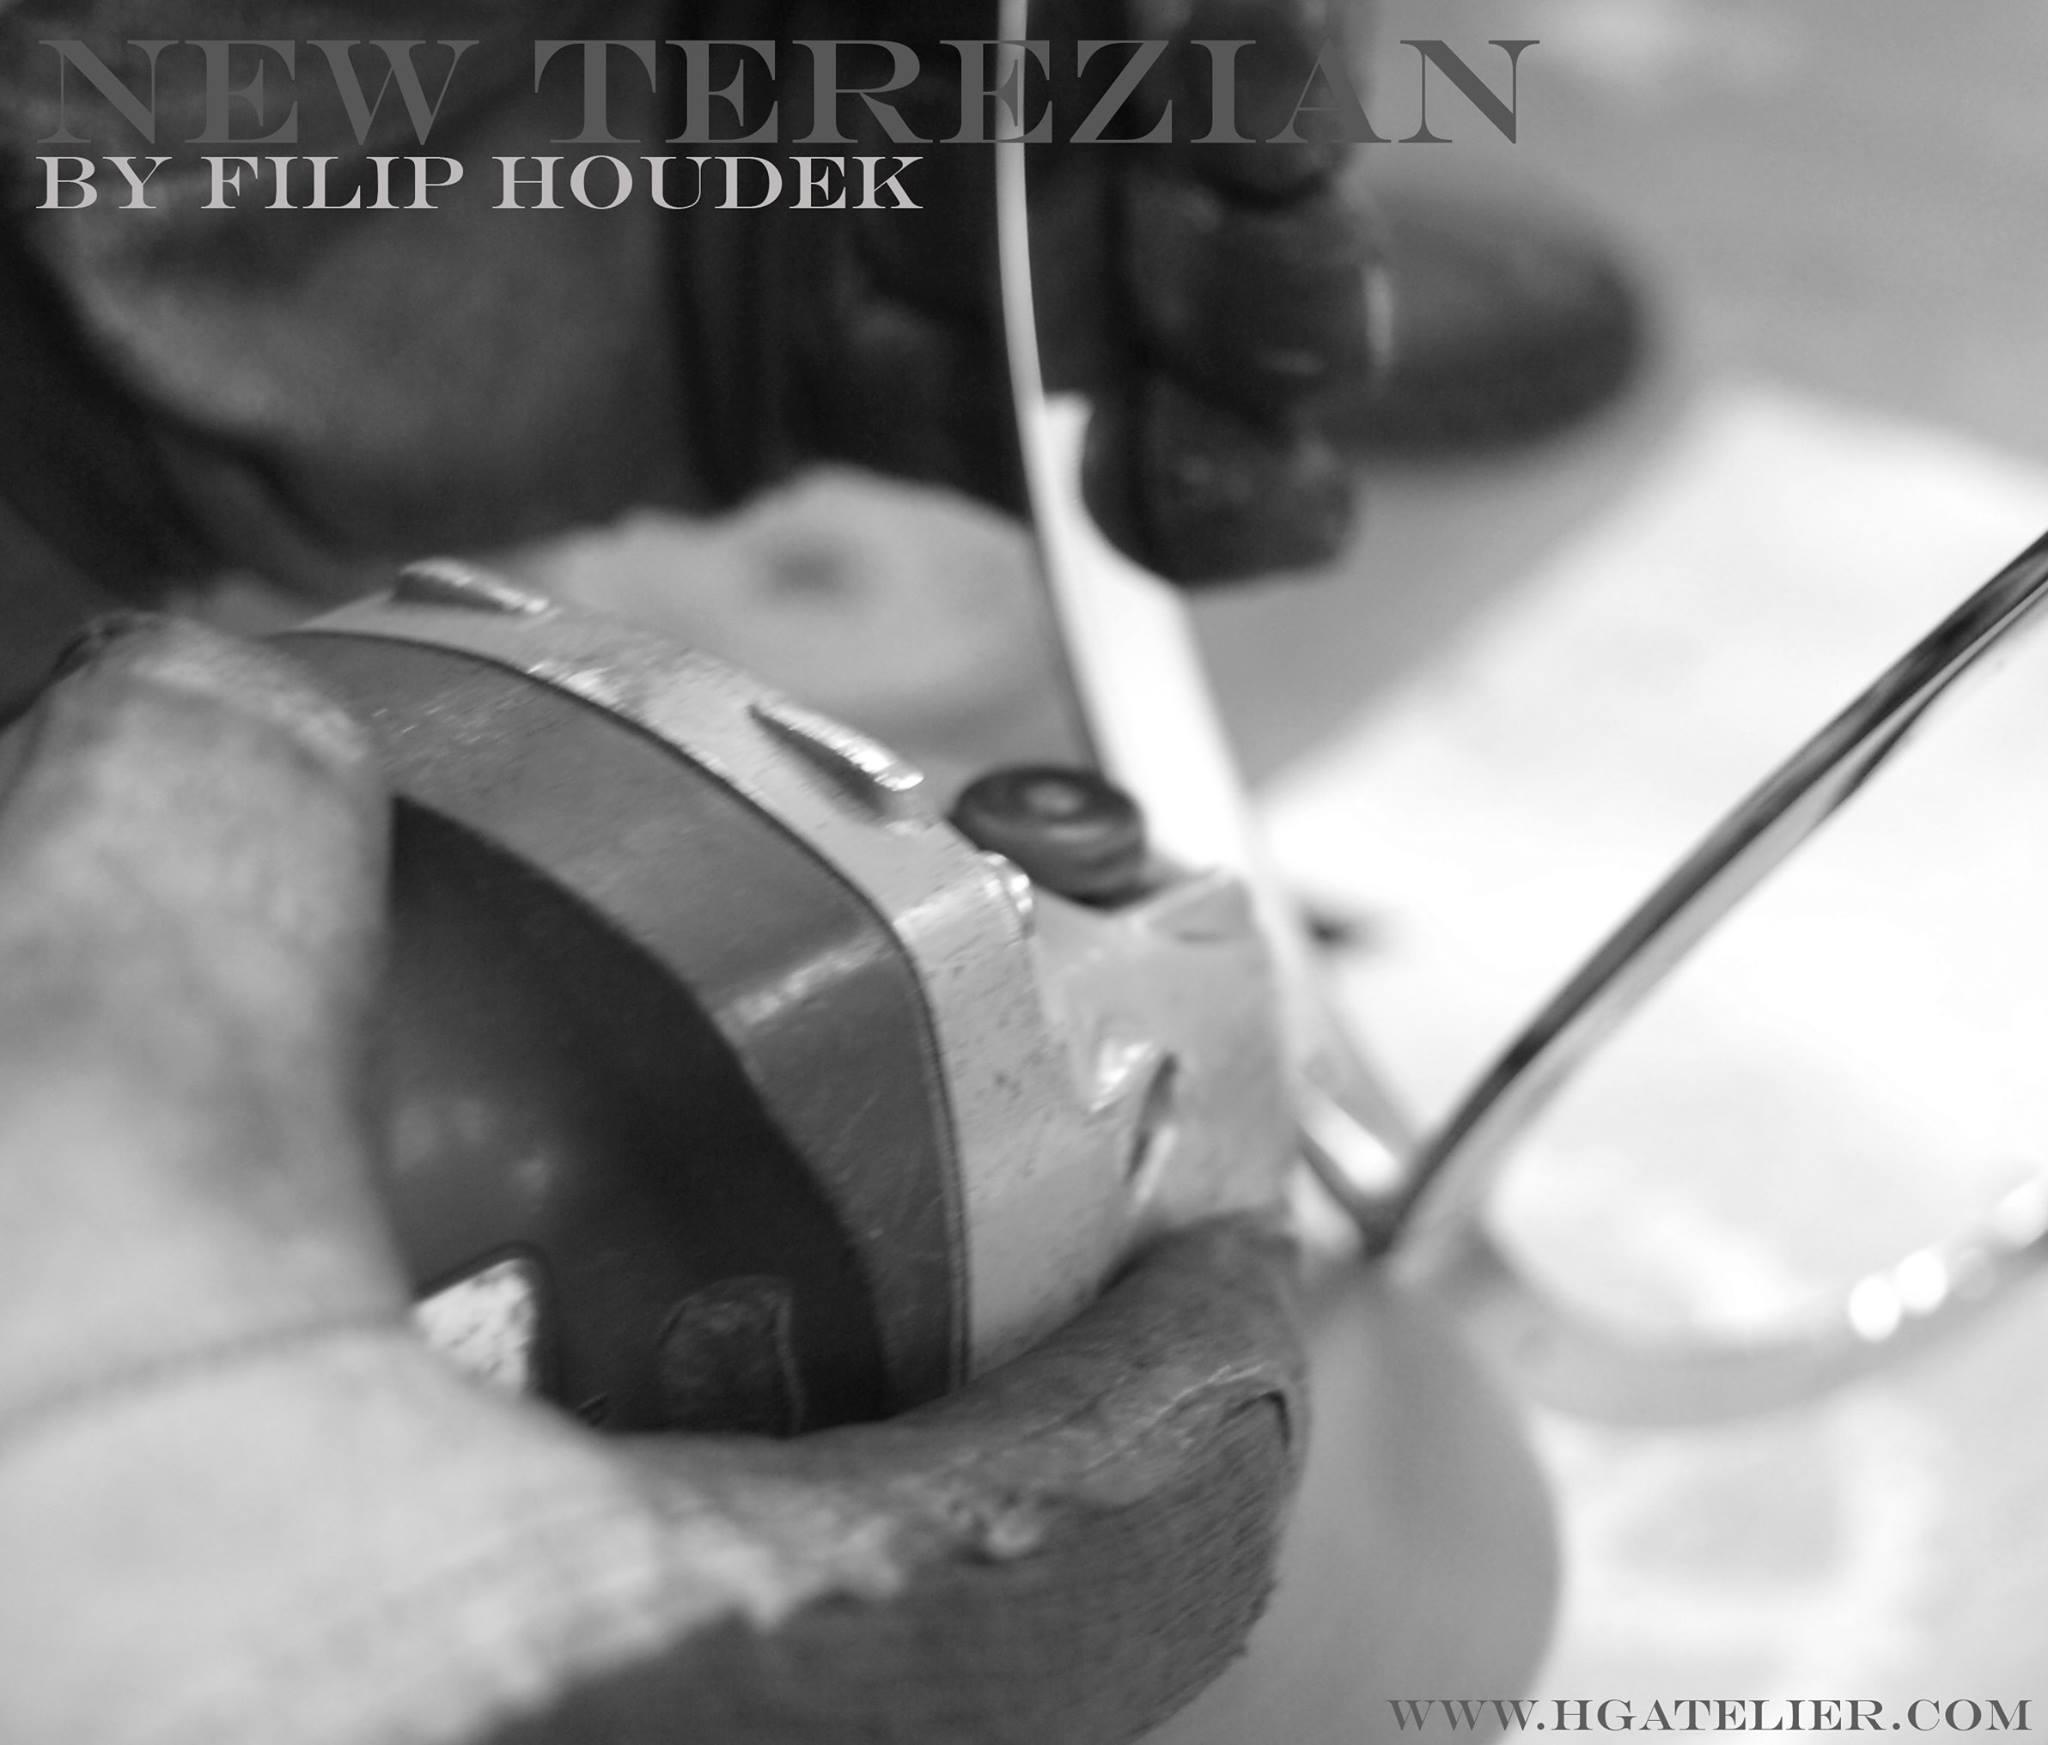 New Terezian - Ries ProDesign Jana Ries - Innenarchitektur Linz